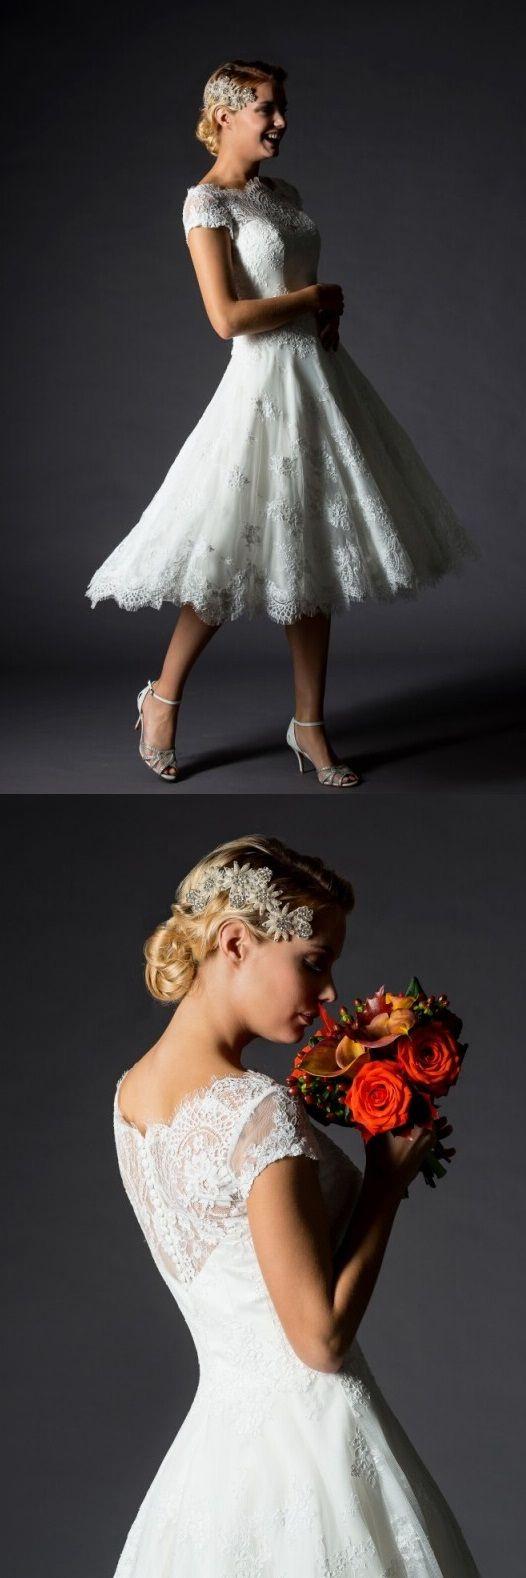 Wedding dresses tea length  vintage lace overlay organza tea length wedding dress  Wedding